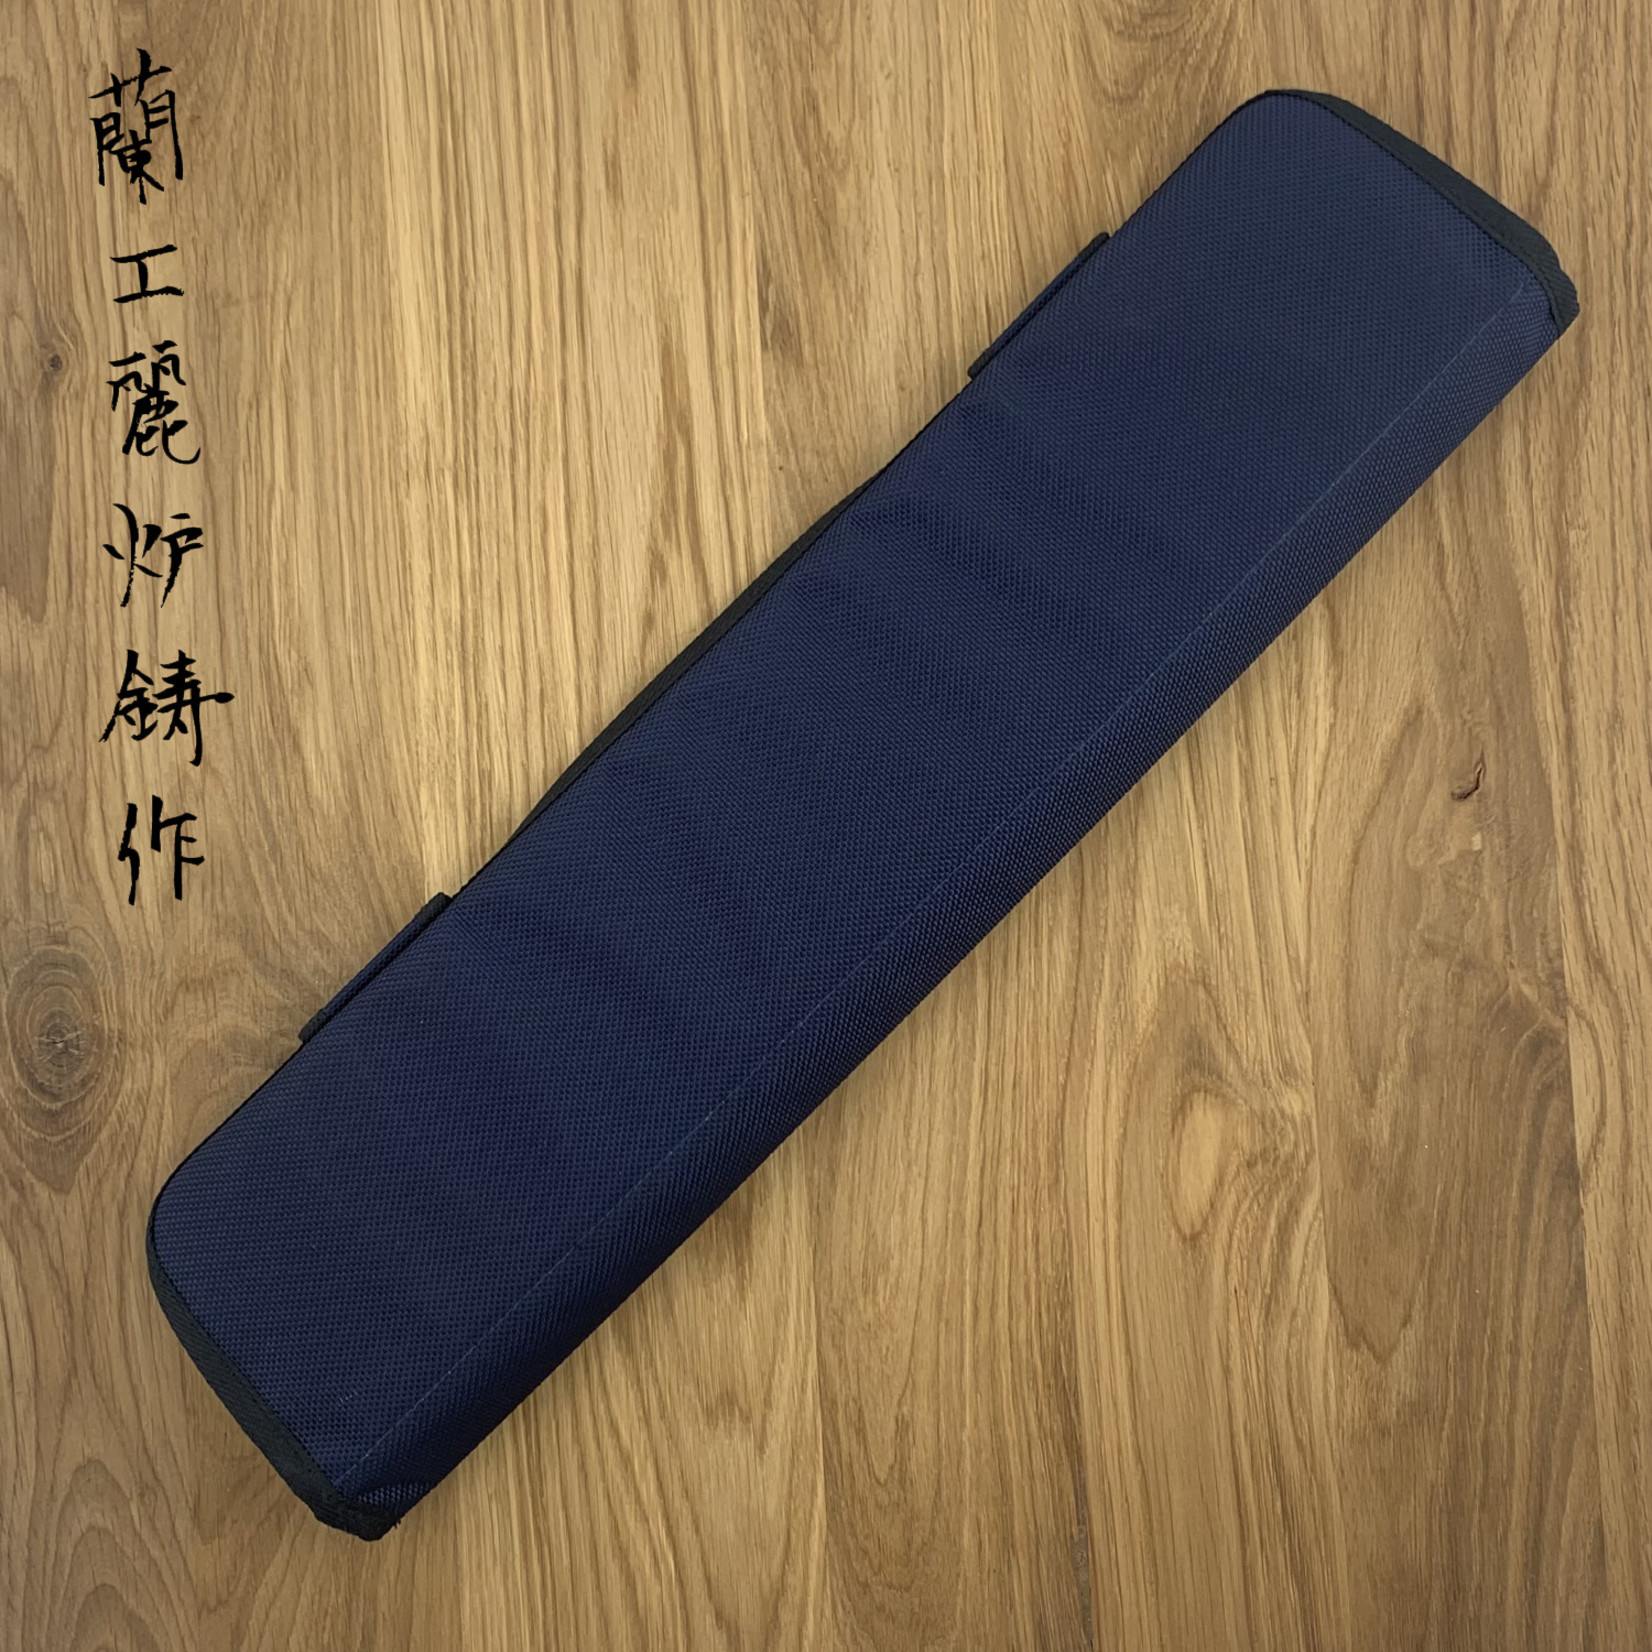 NENOHI NENOX knifebag 2 items in blue